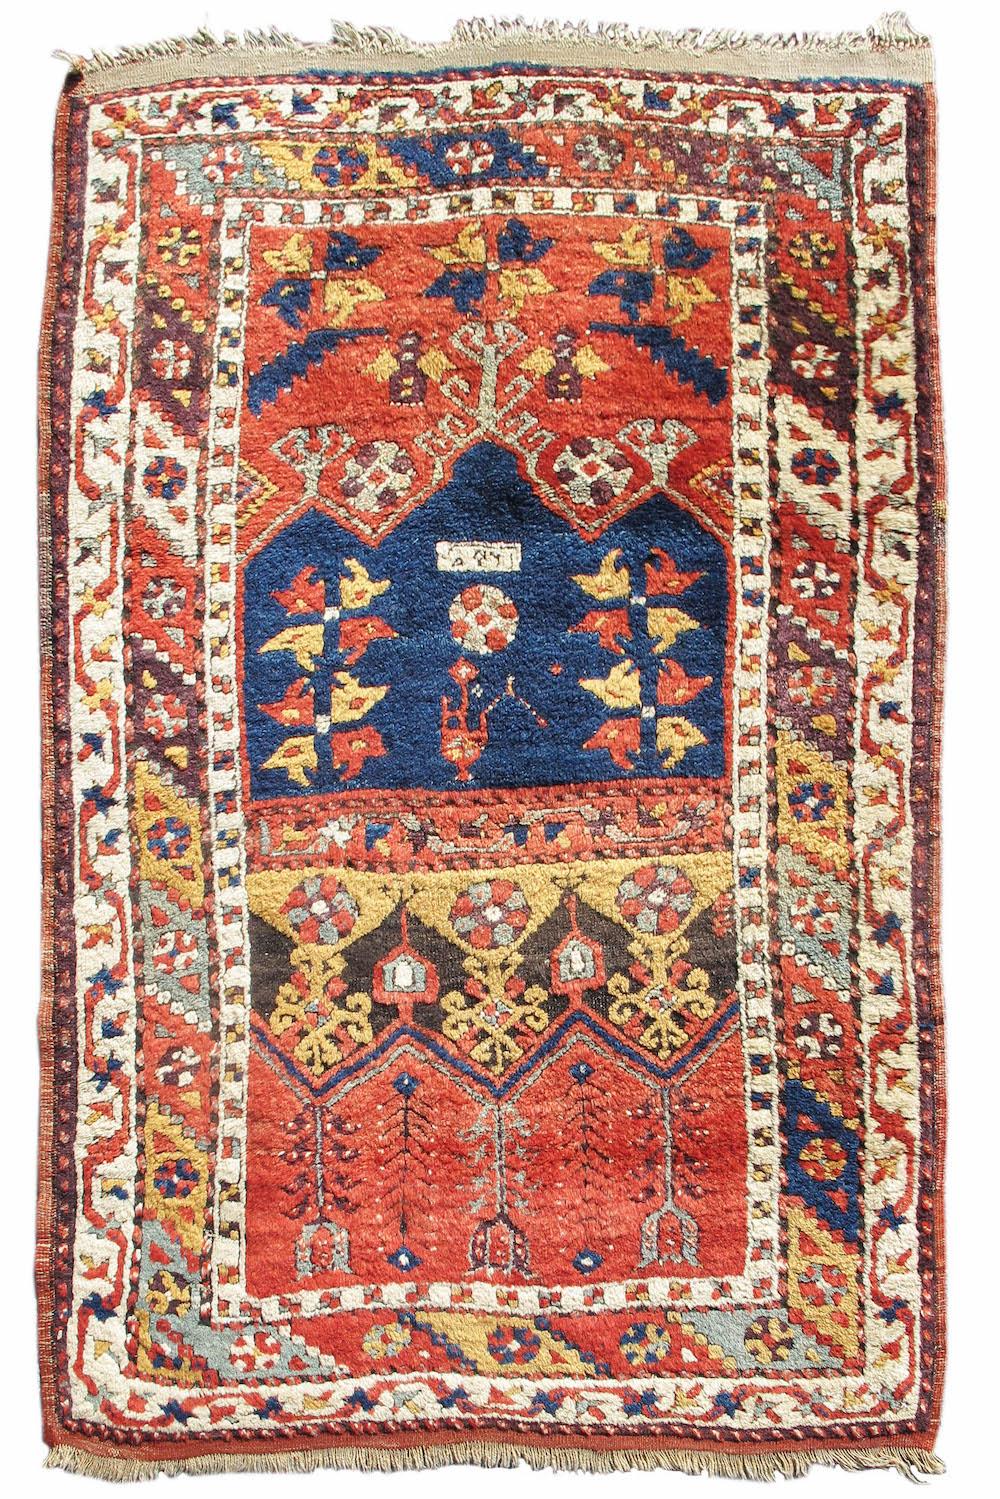 Konya area prayer rug